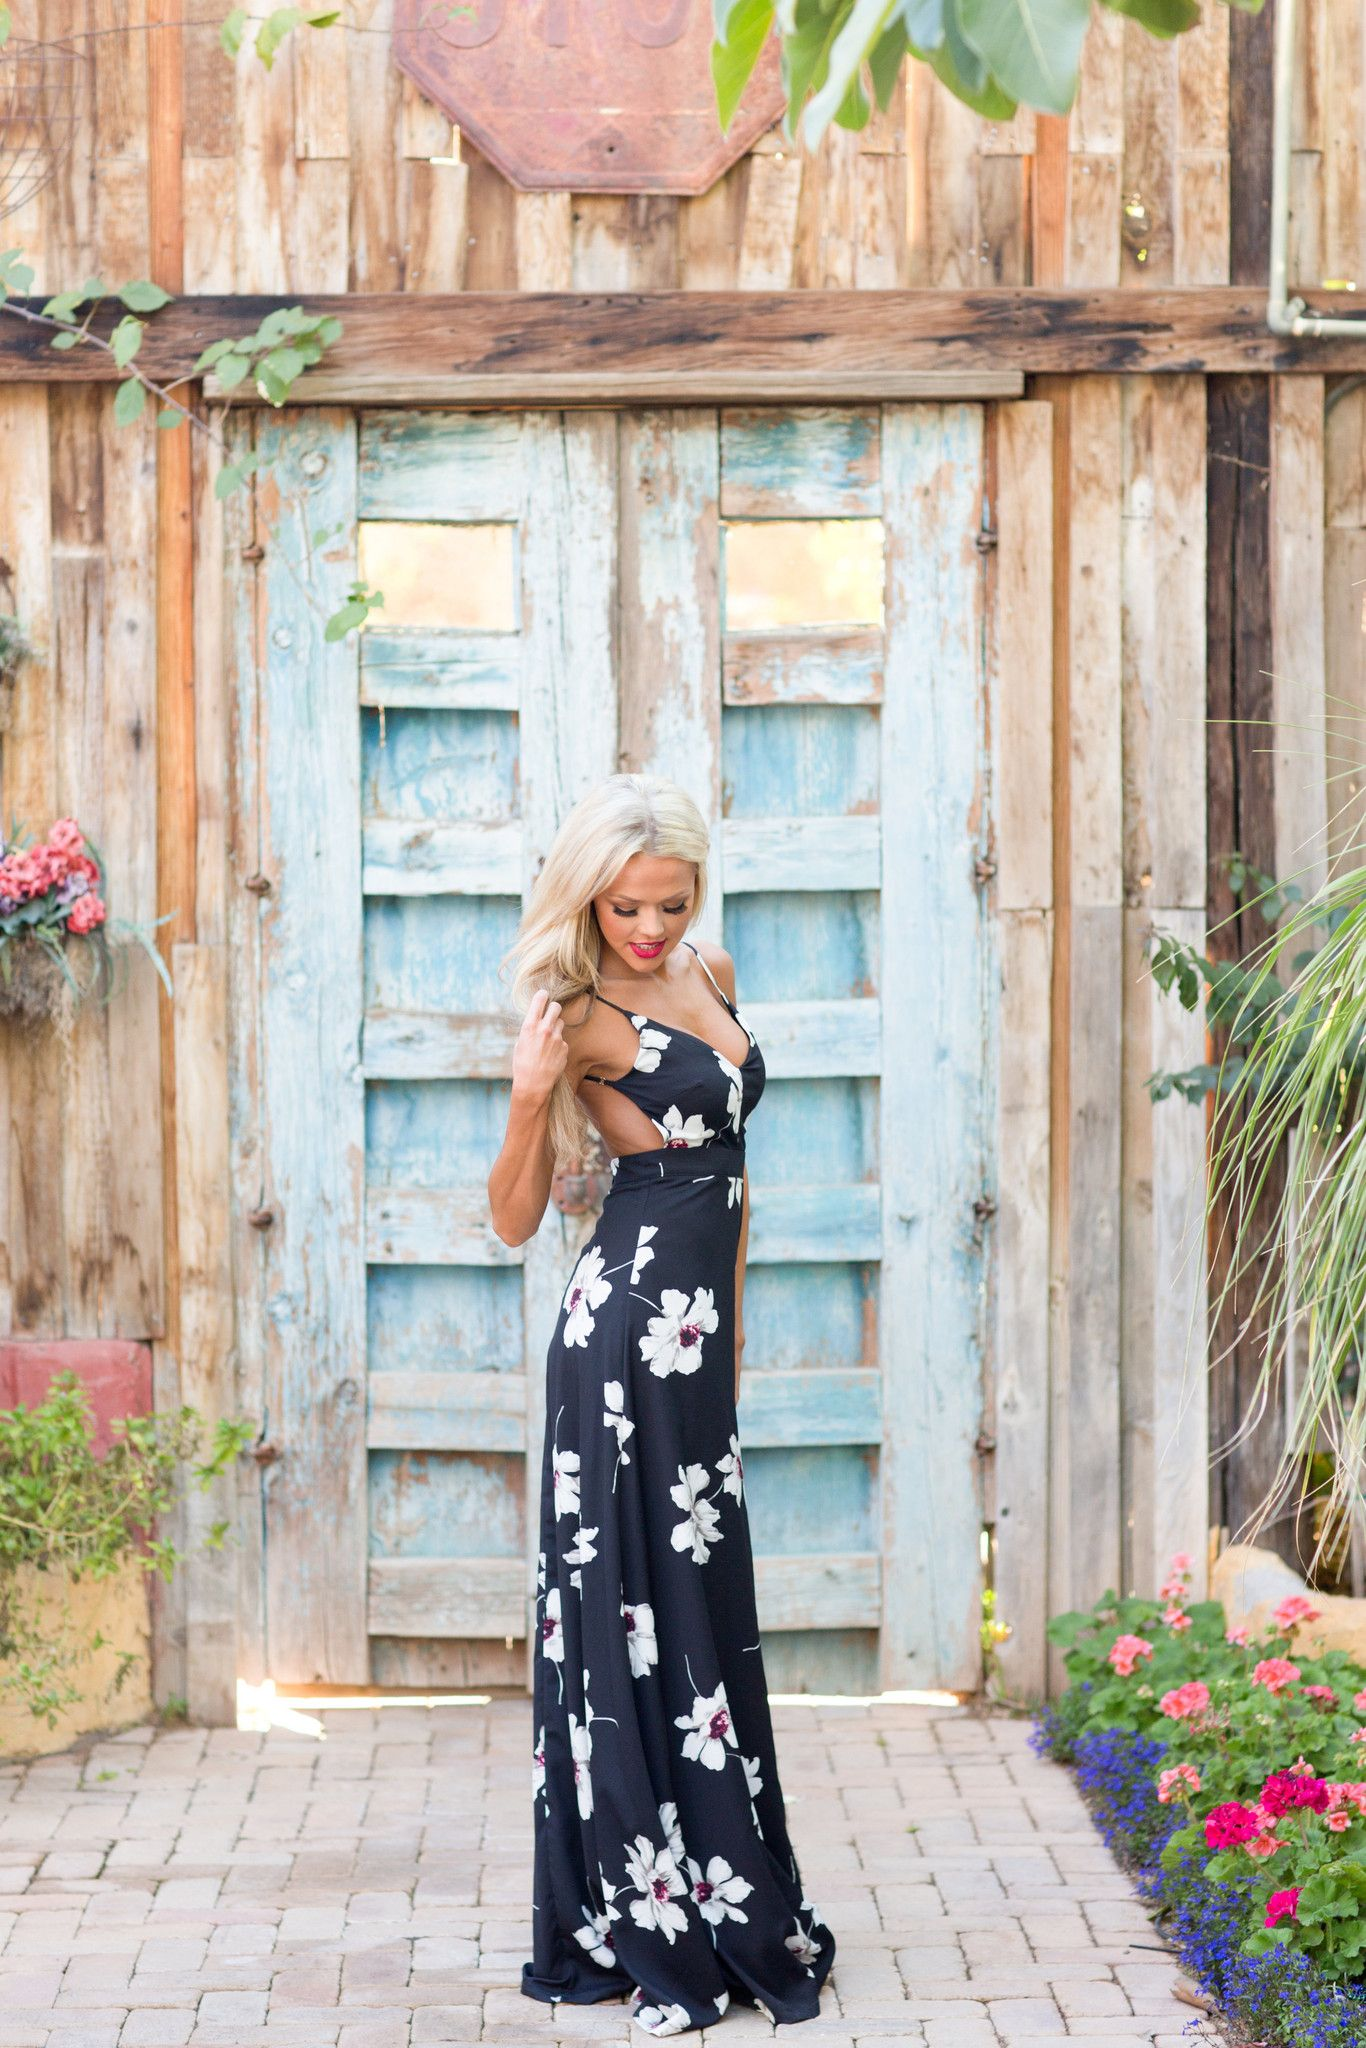 Wonderful Wildflowers Maxi Dress - Black